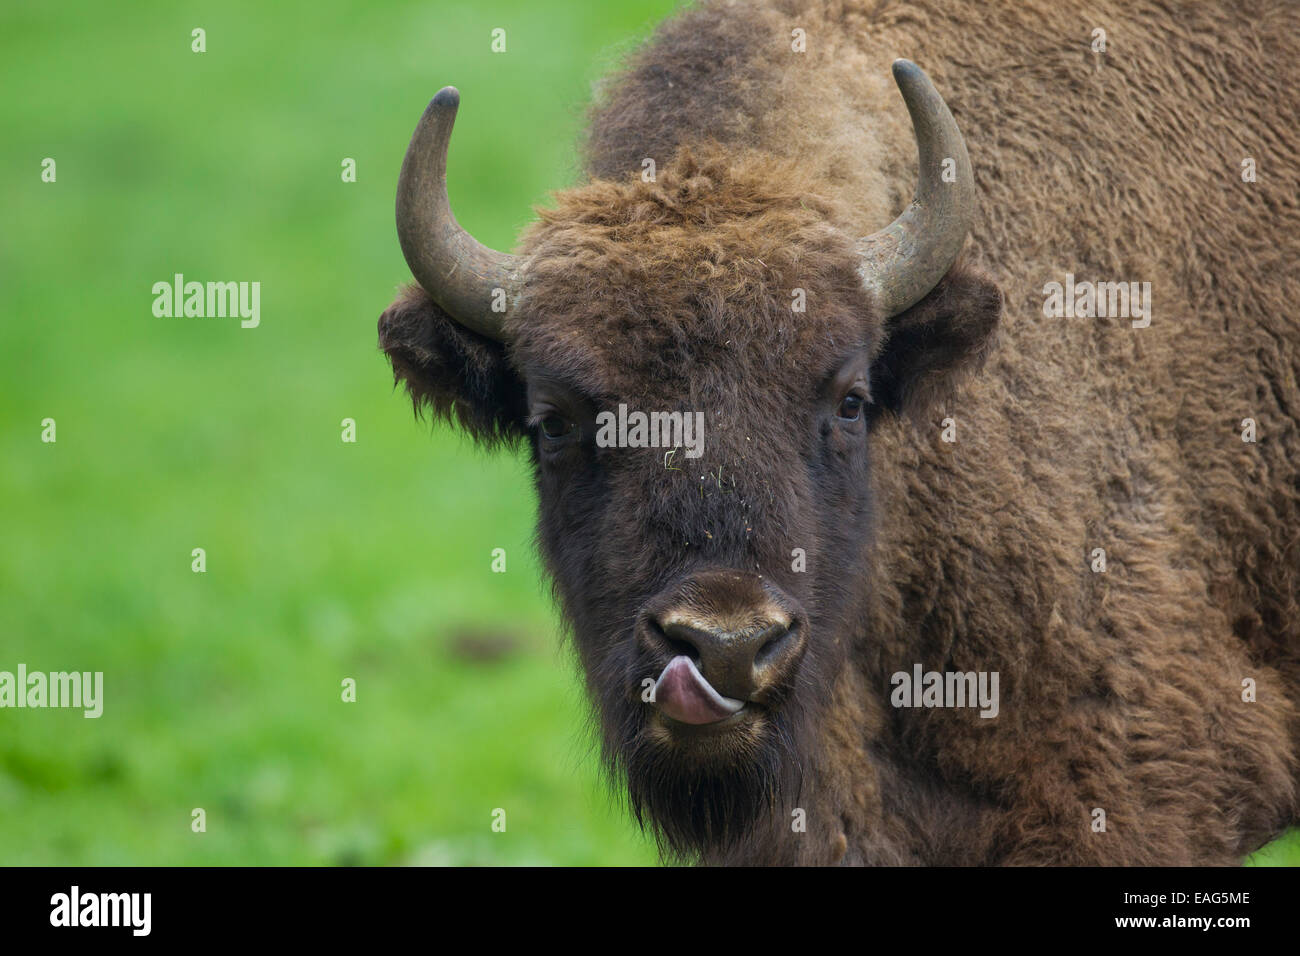 Close up portrait of European bison / wisent (Bison bonasus) licking its nose - Stock Image